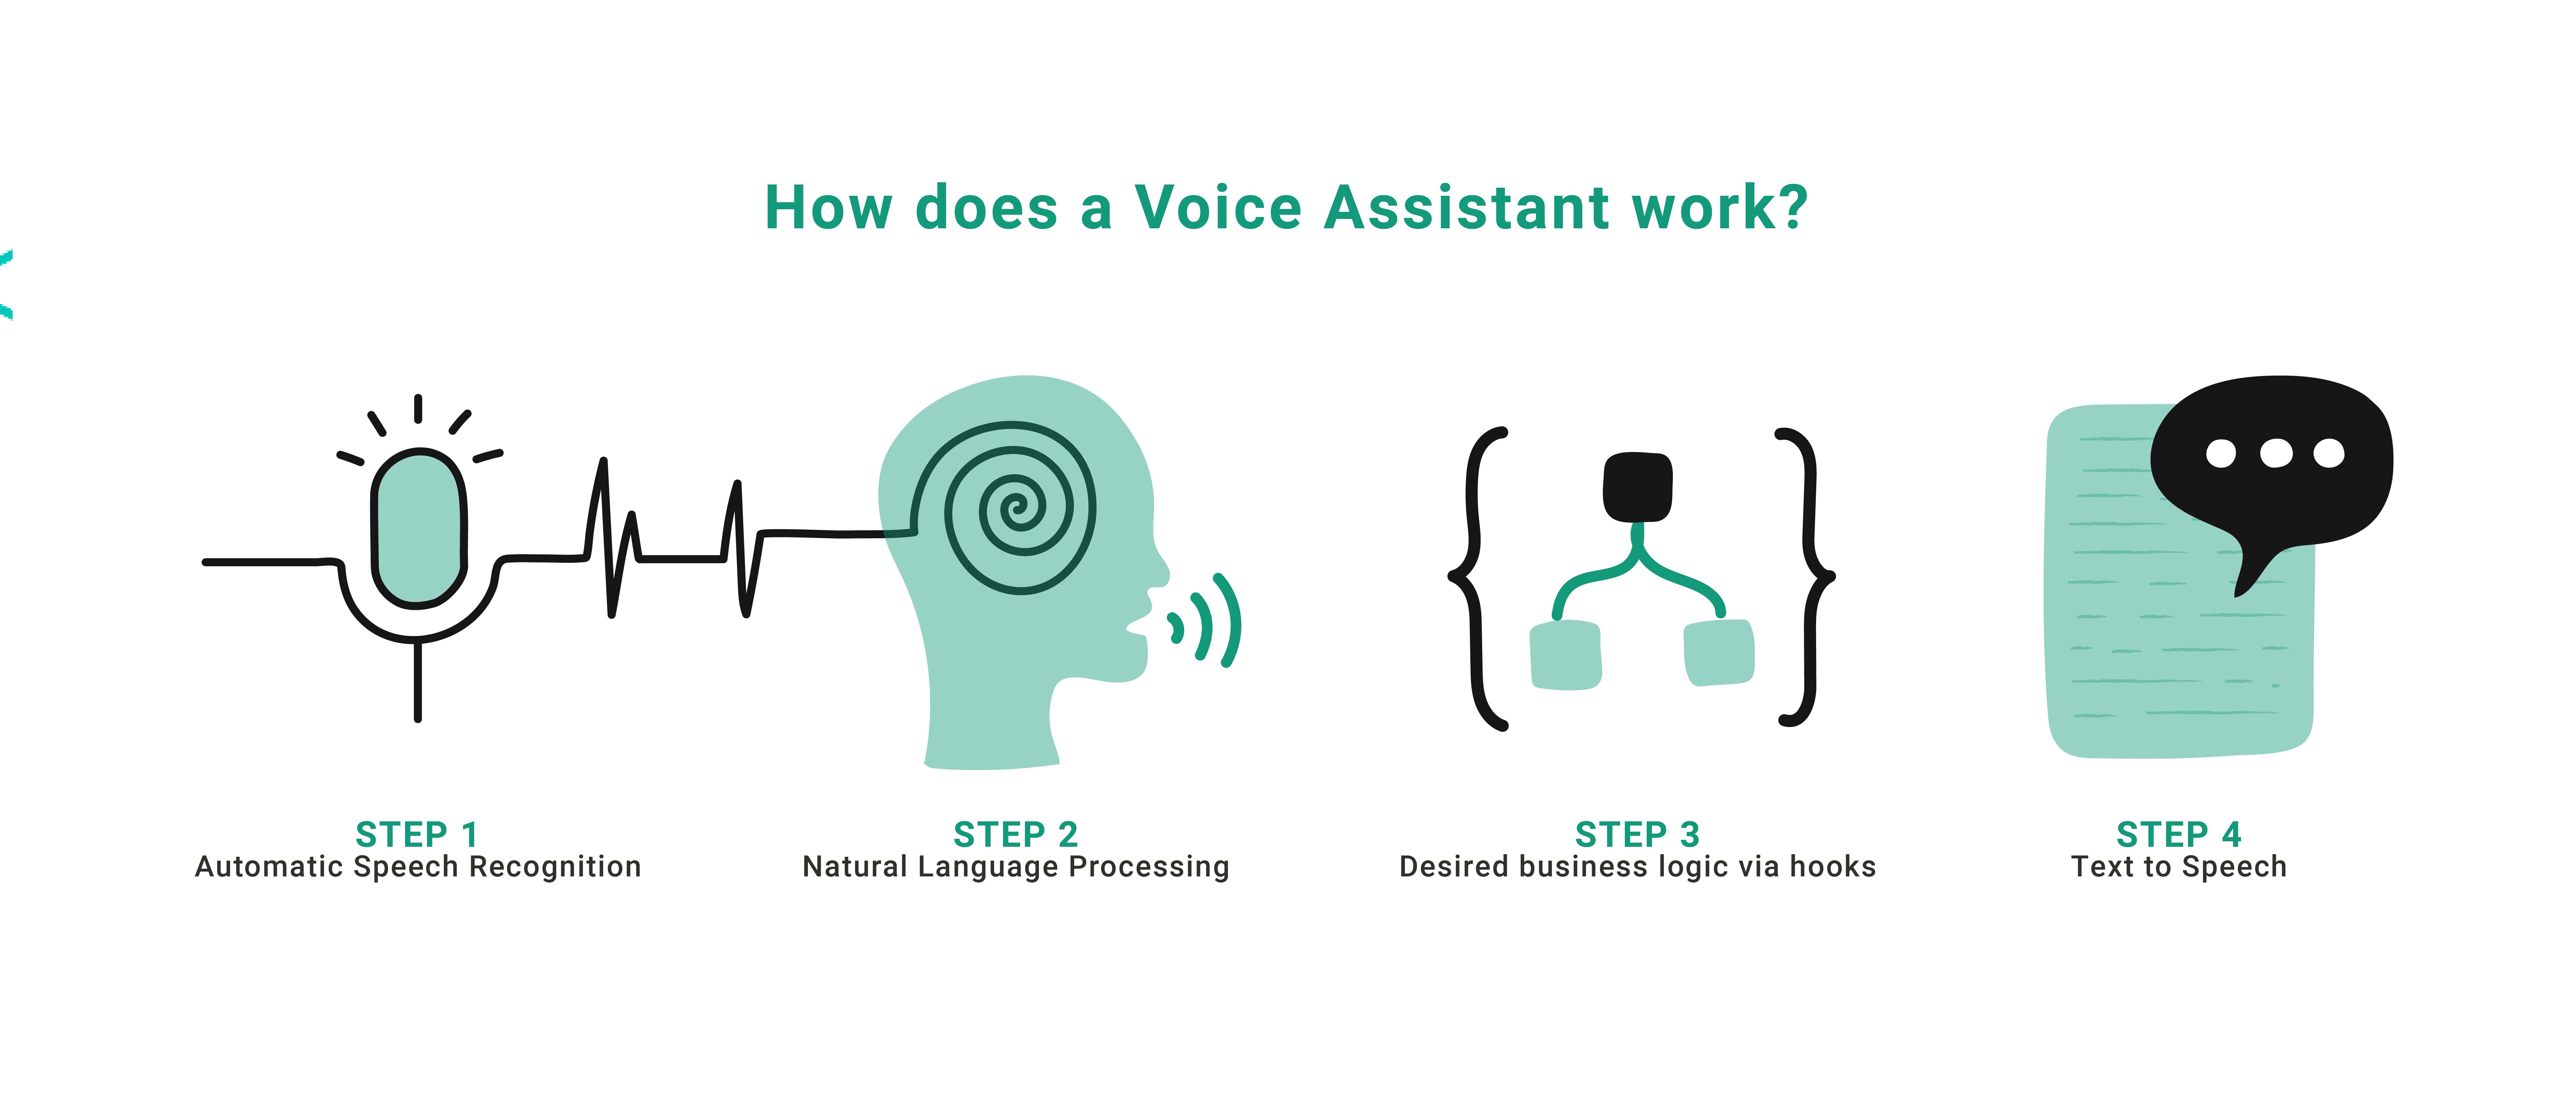 How do Voice Assistants work?  ASR, NLP, Processing, TTS